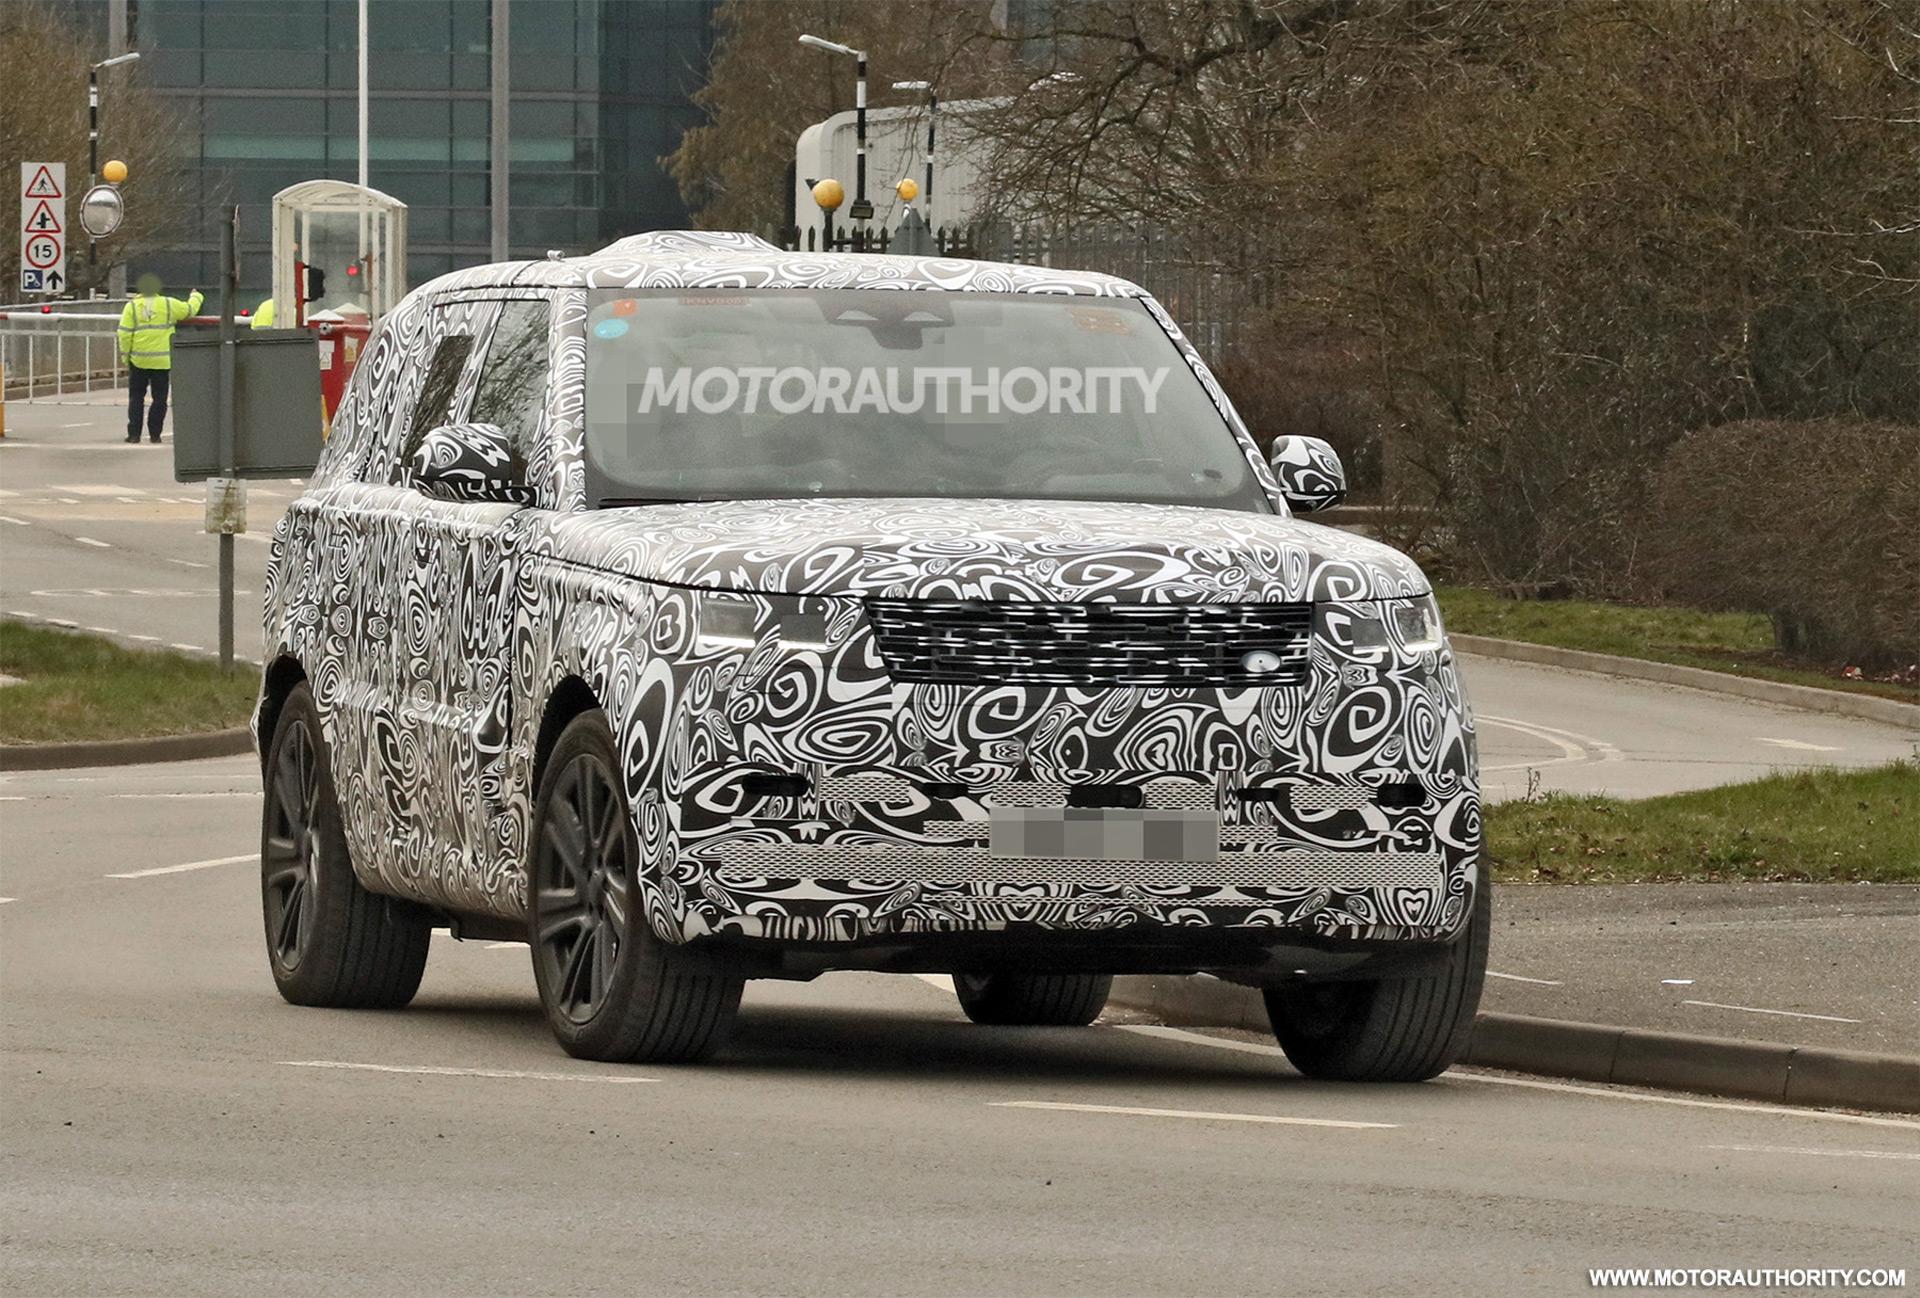 2022 Land Rover Range Rover spy shots: Familiar look belies new platform